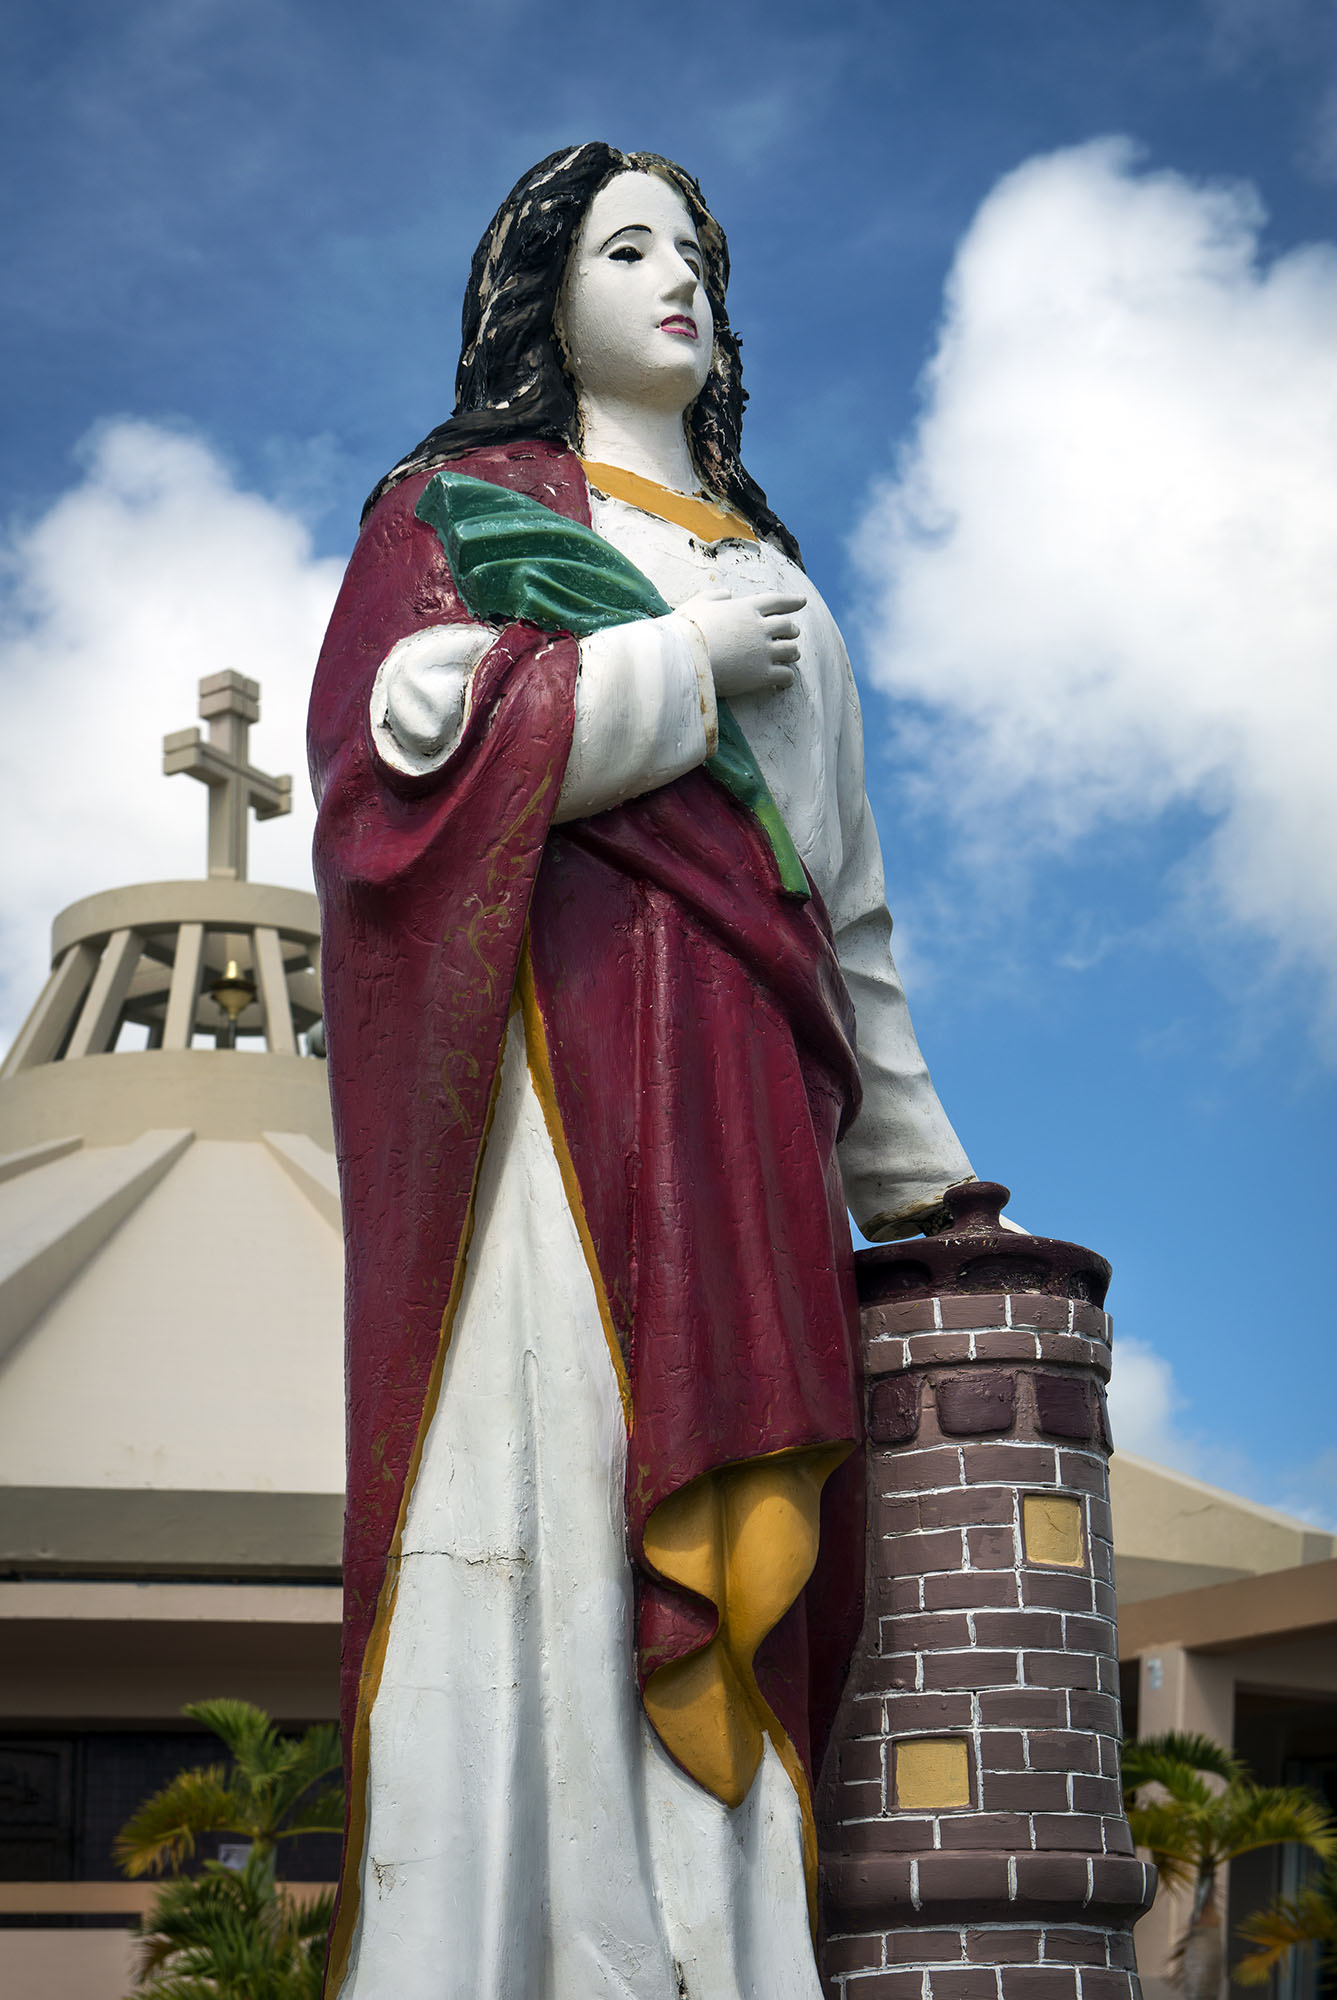 <p>This statuegreets parishioners at the Parish of Santa Barbara on Guam, where Chukeese hold regular services.</p>